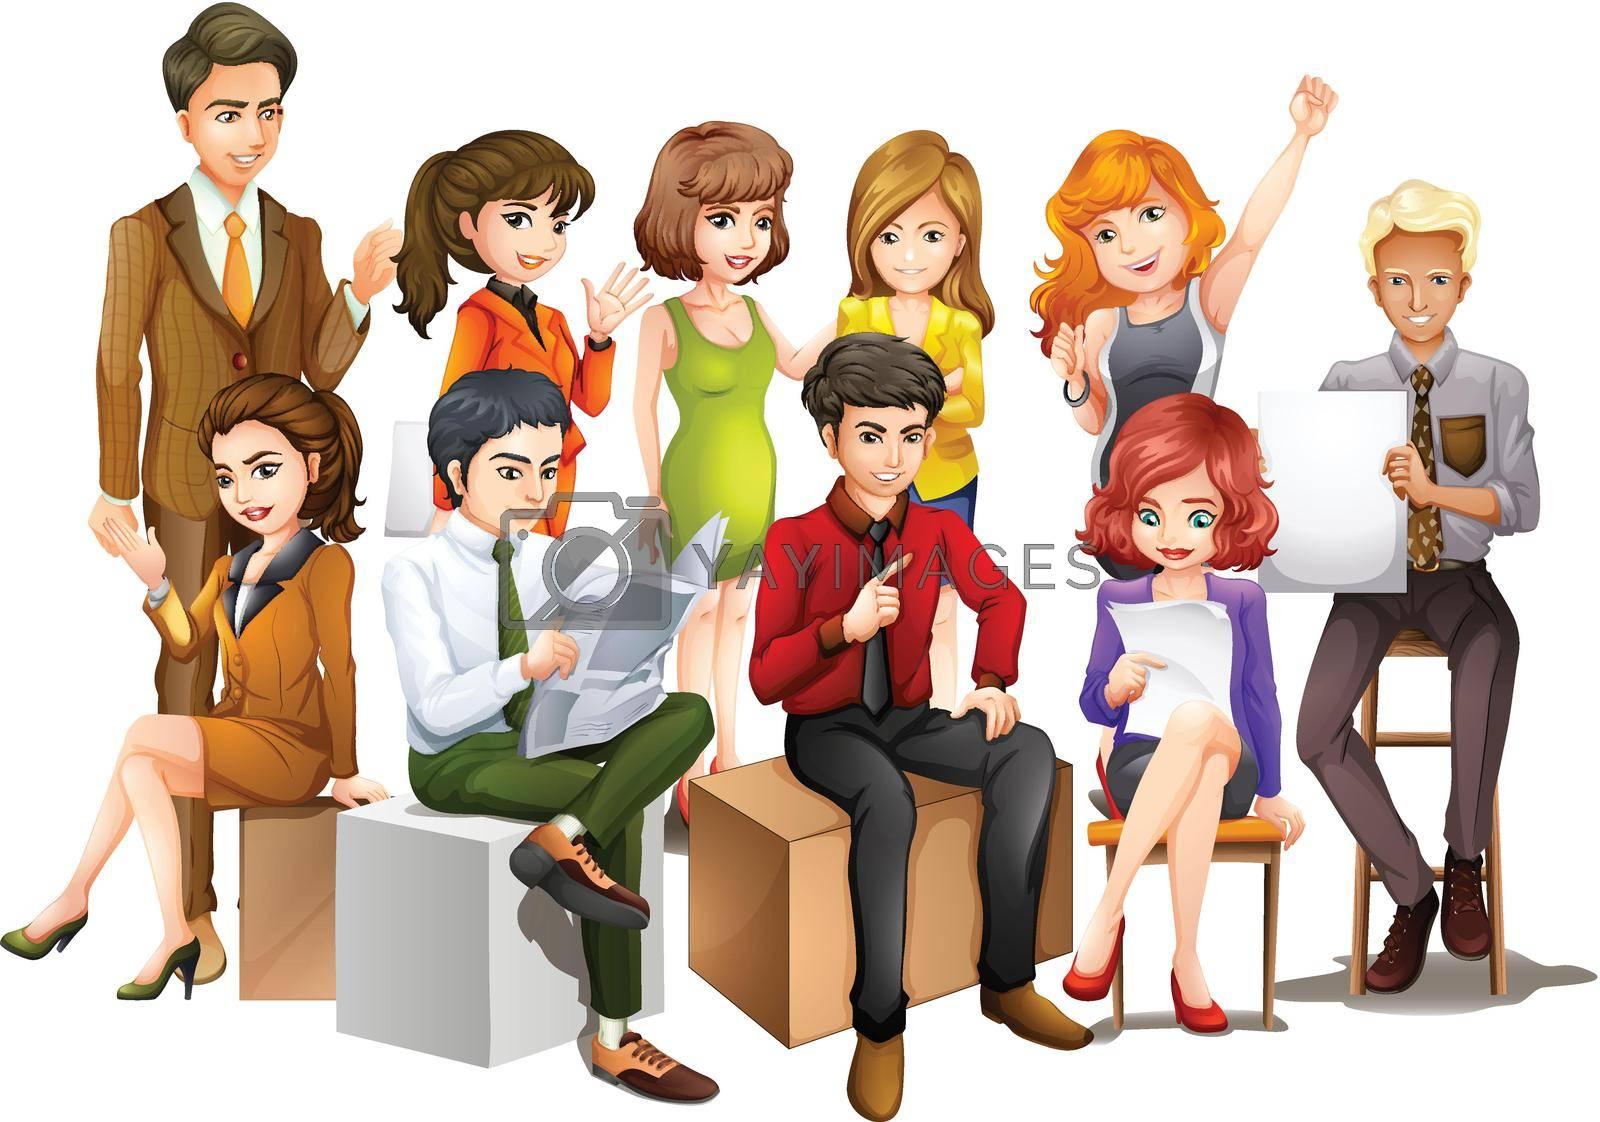 Royalty free image of People by iimages